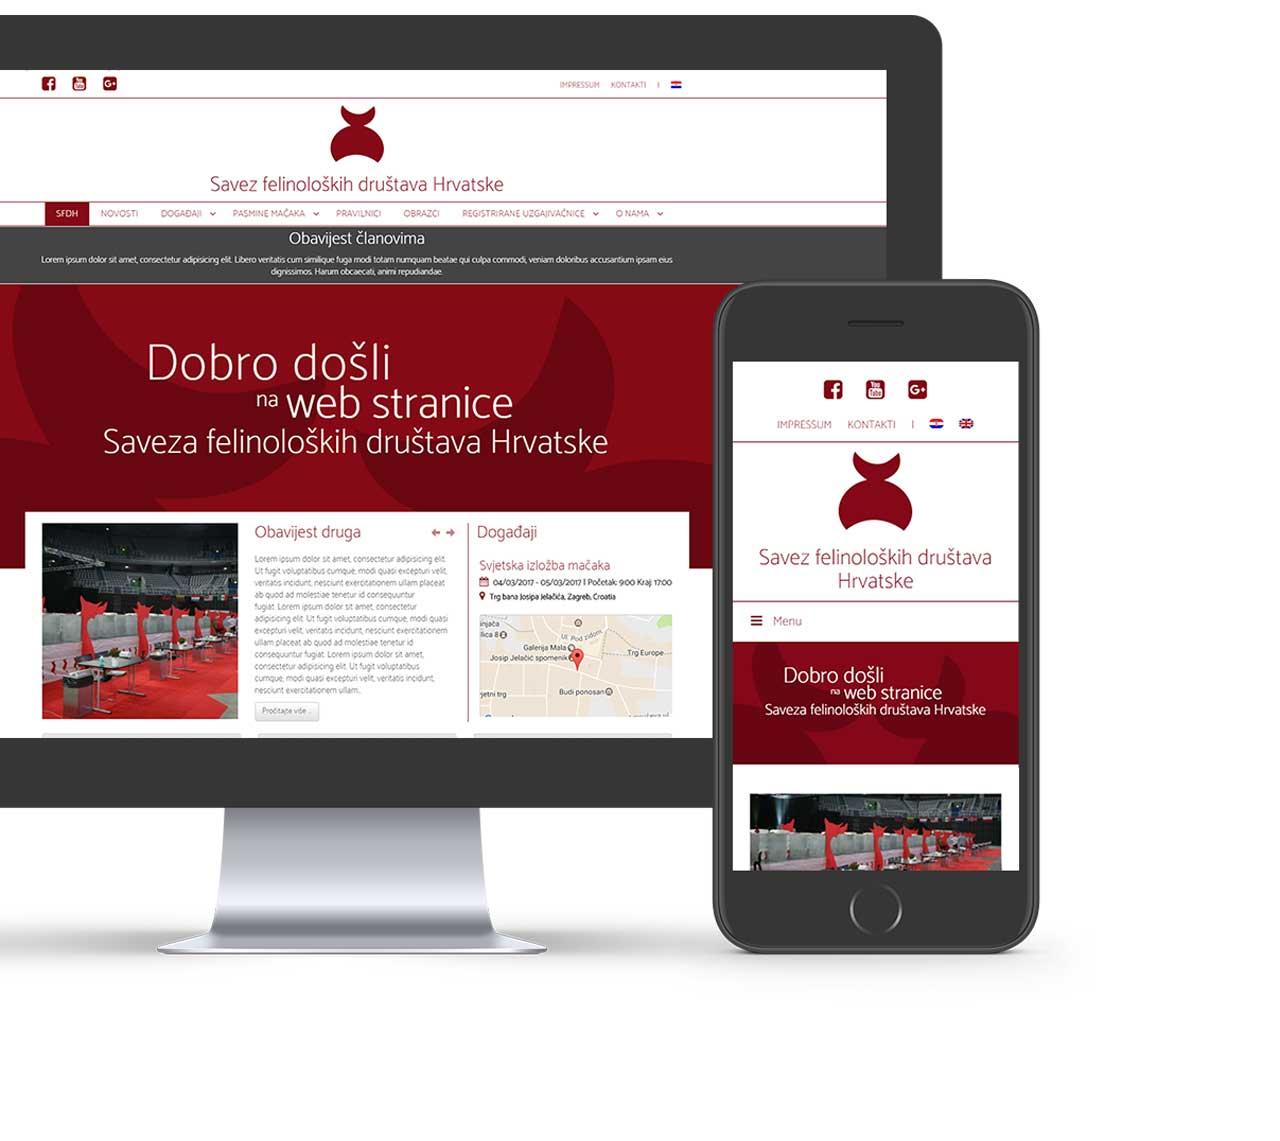 Web page mockup